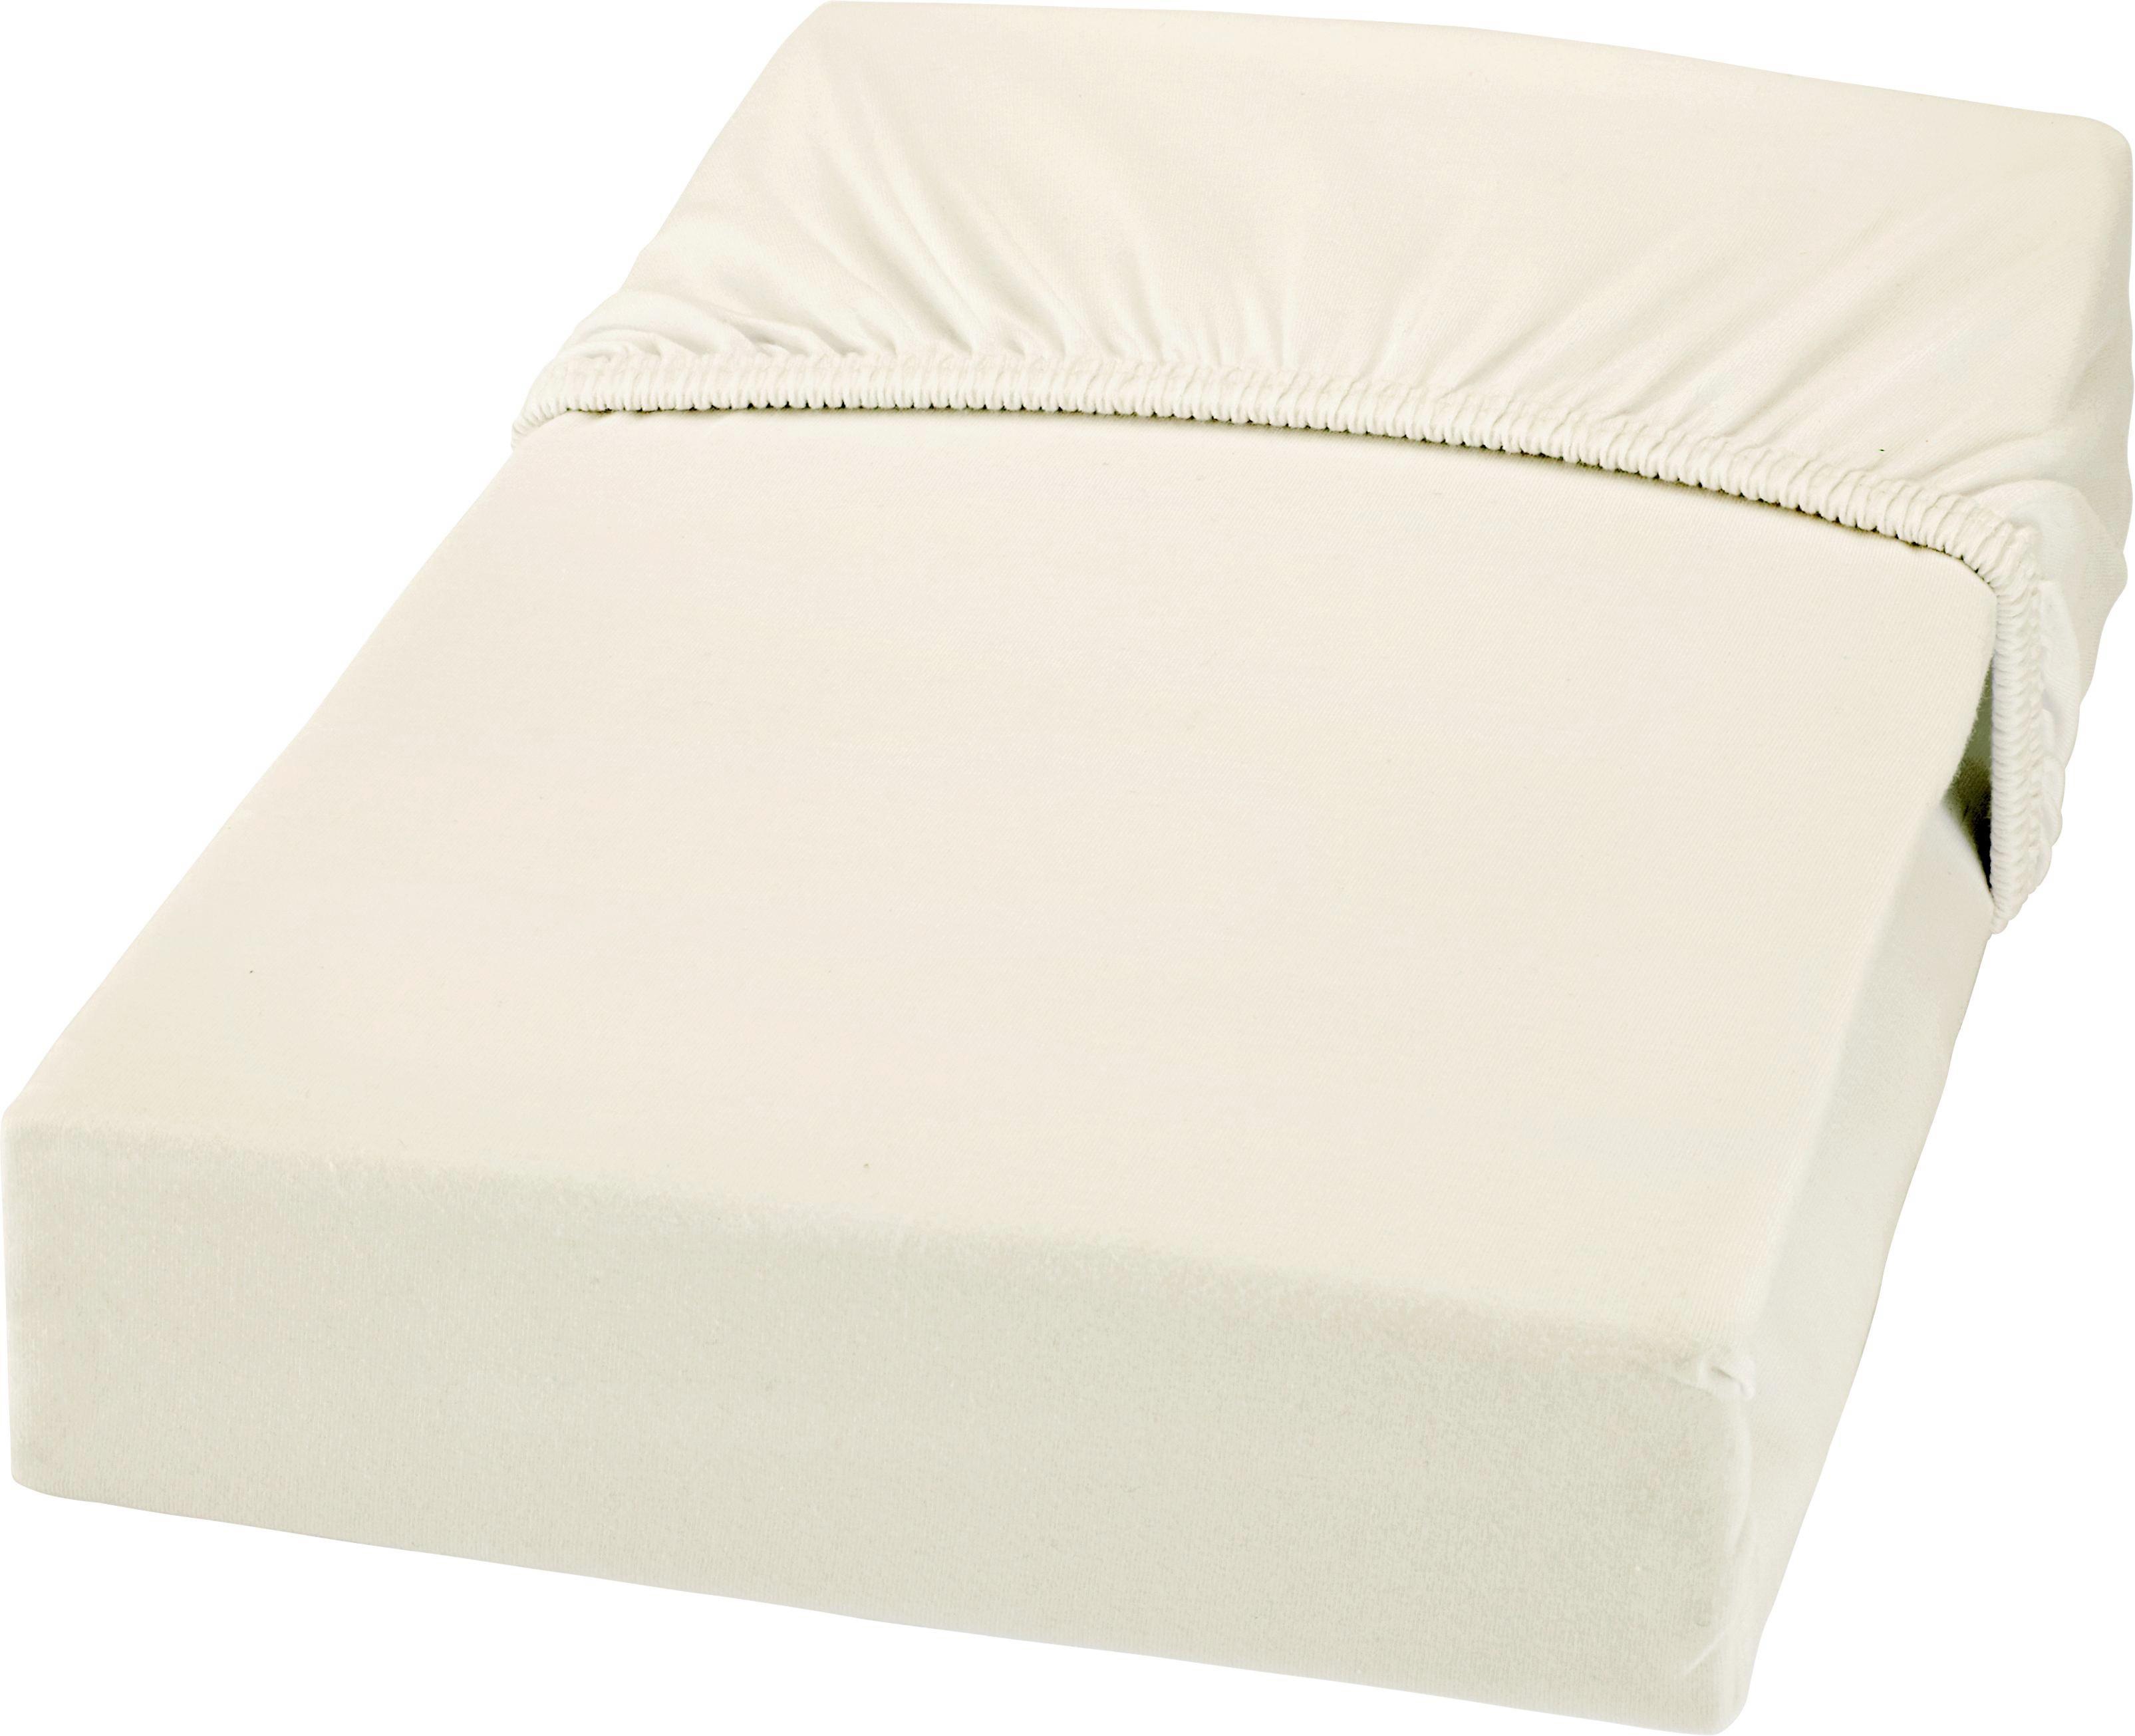 Spannbetttuch Jersey 100x200 cm - Naturfarben, MODERN, Textil (100/200cm) - MÖMAX modern living